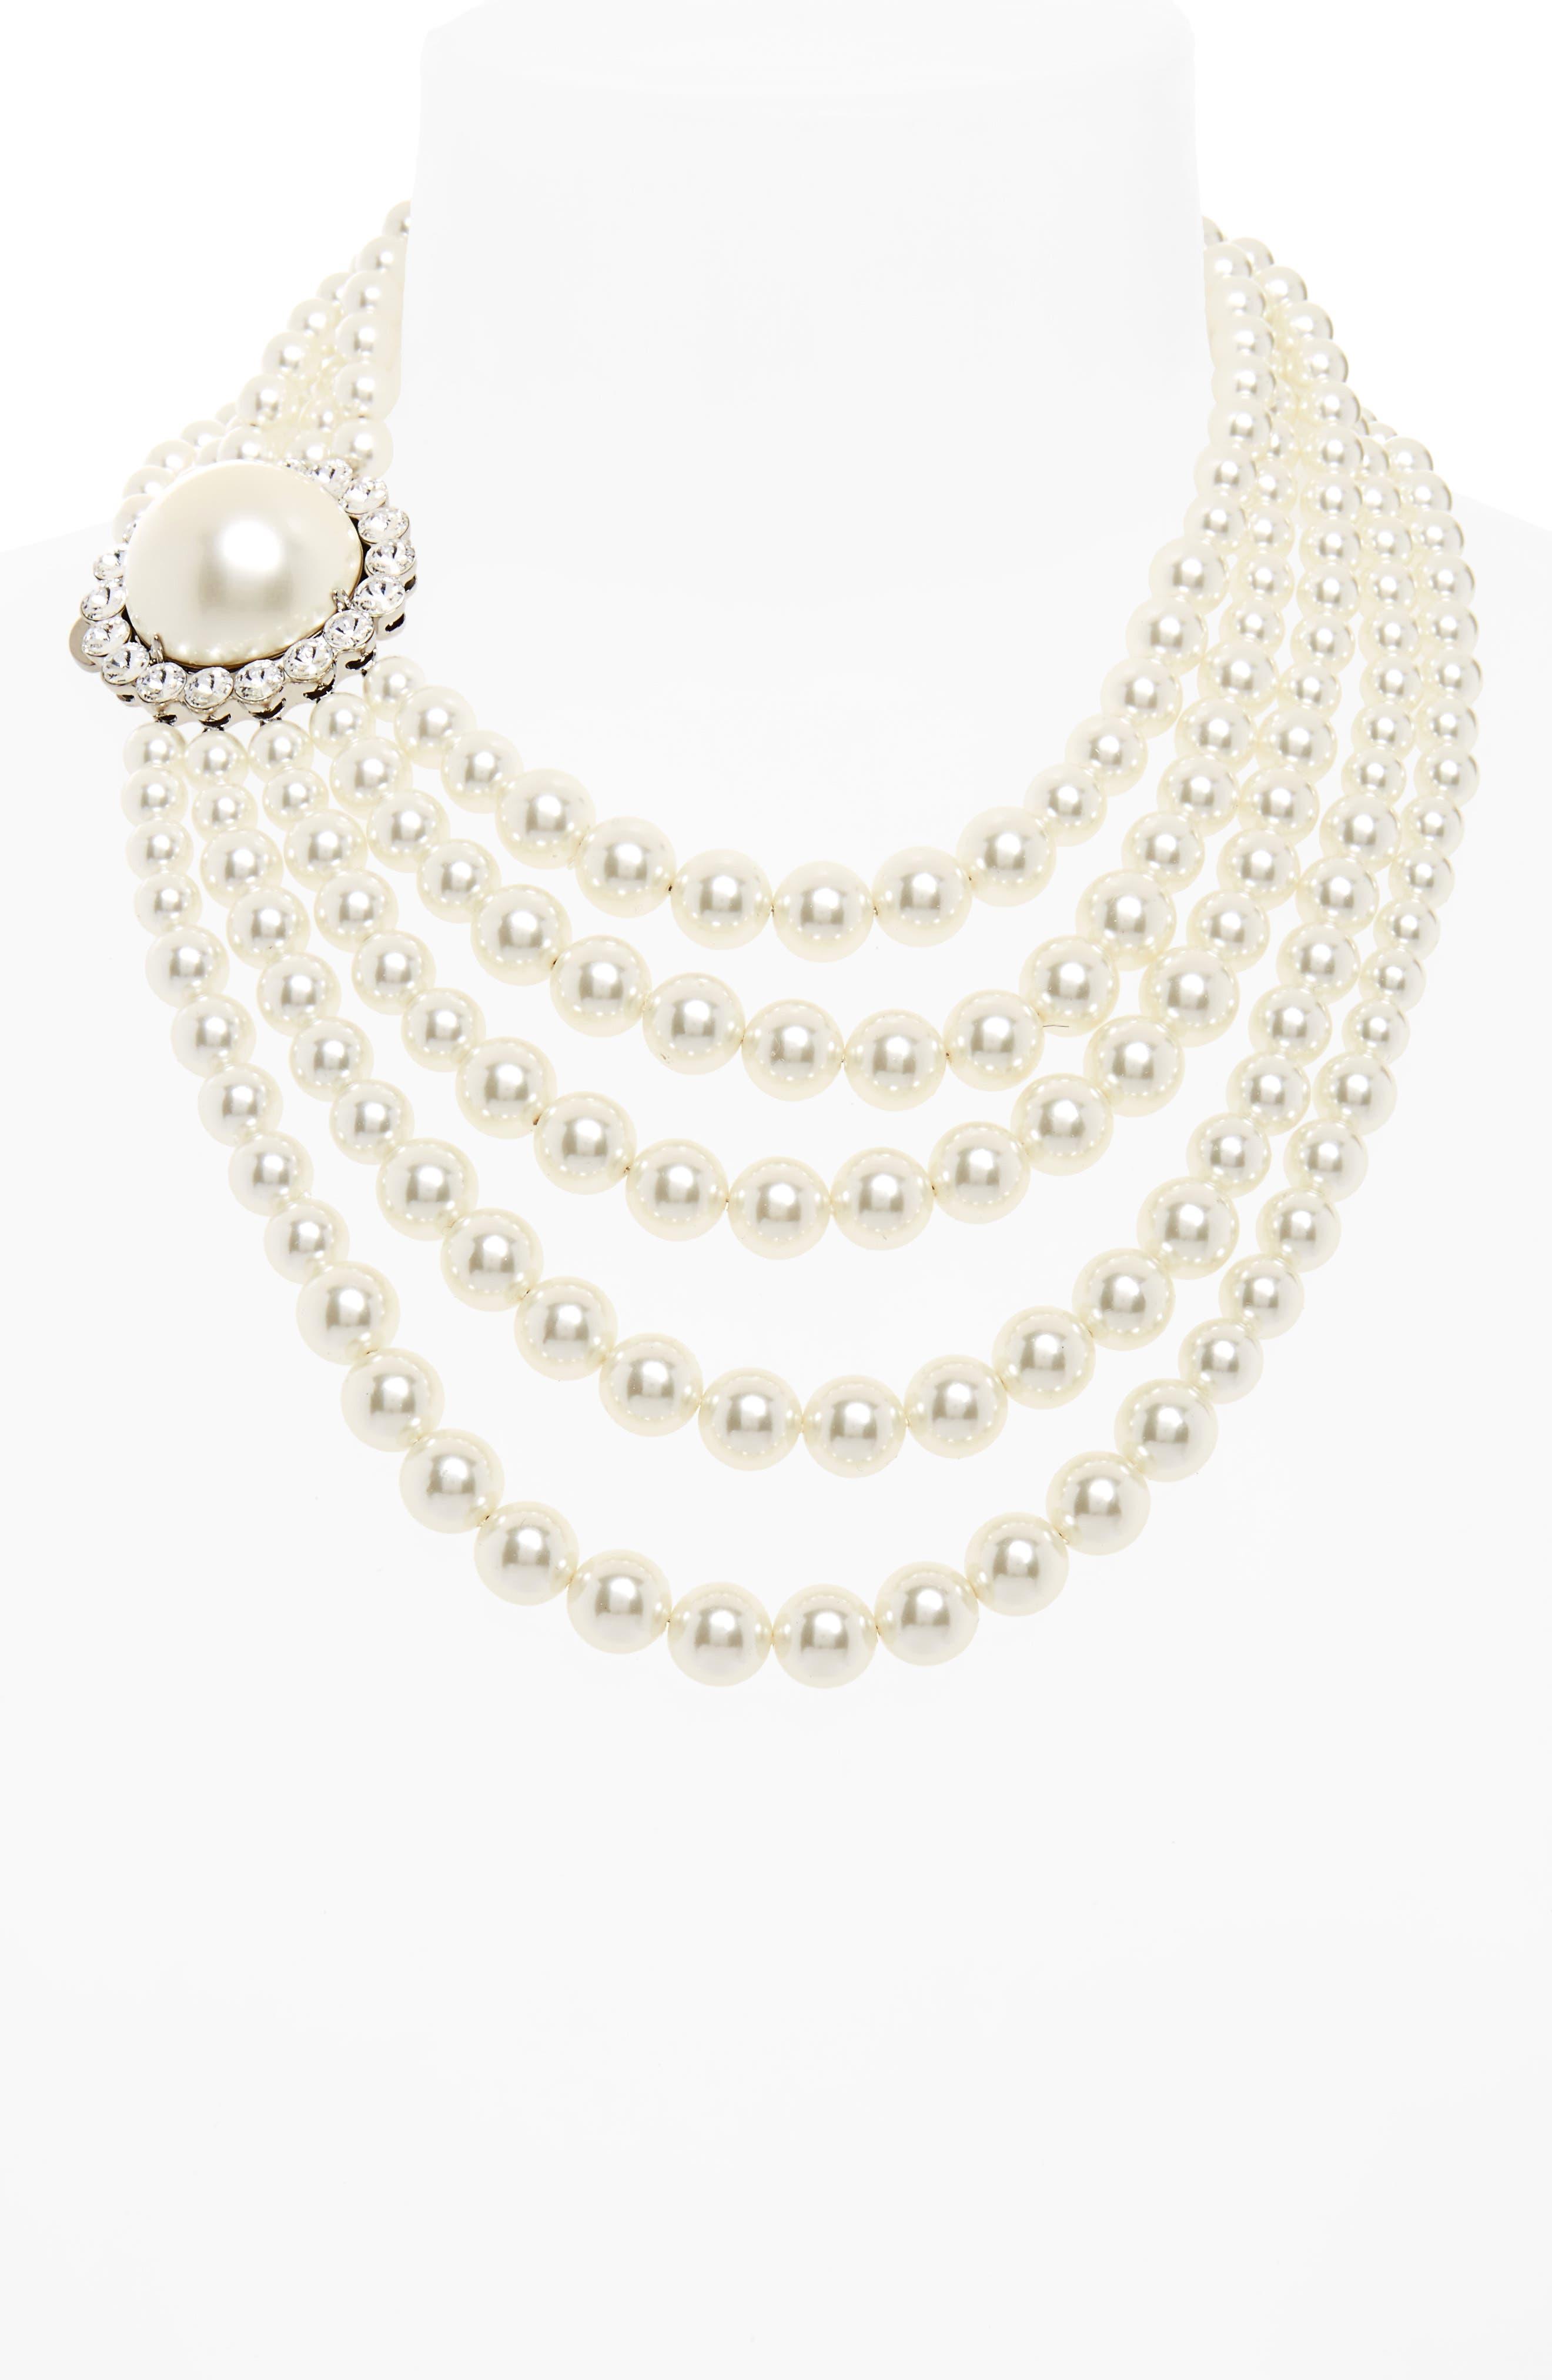 Multistrand Imitation Pearl Necklace,                             Alternate thumbnail 2, color,                             904